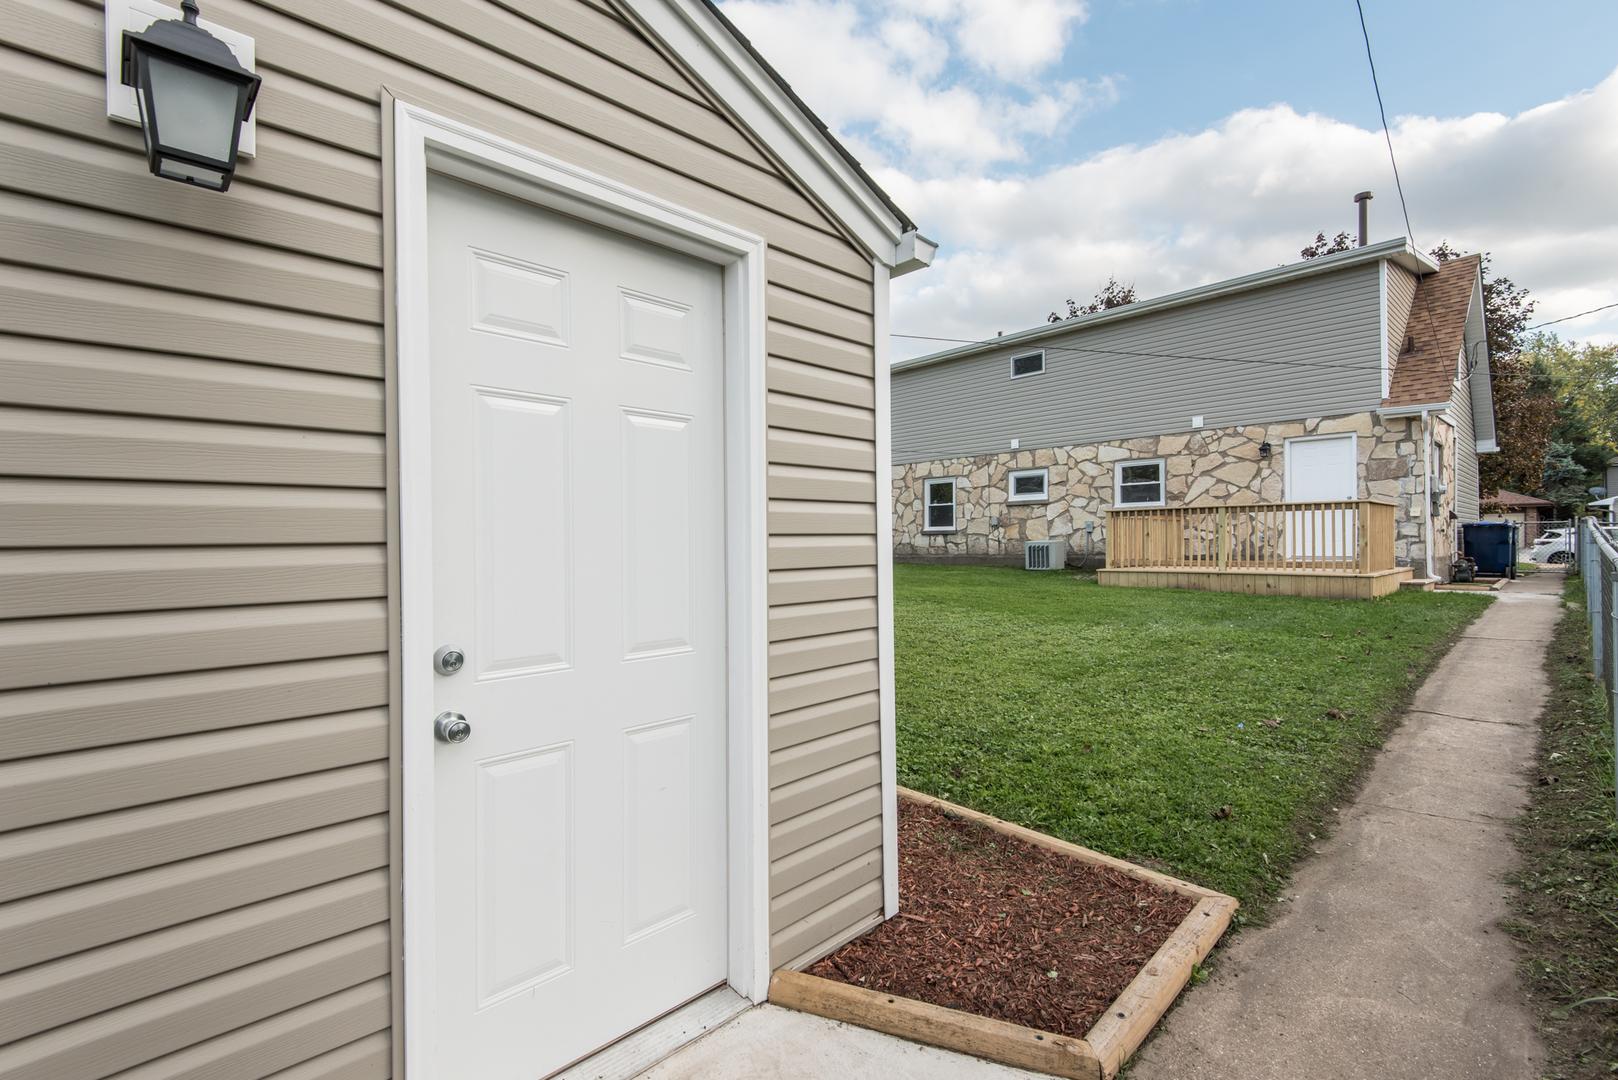 7046 West 115th, Worth, Illinois, 60482